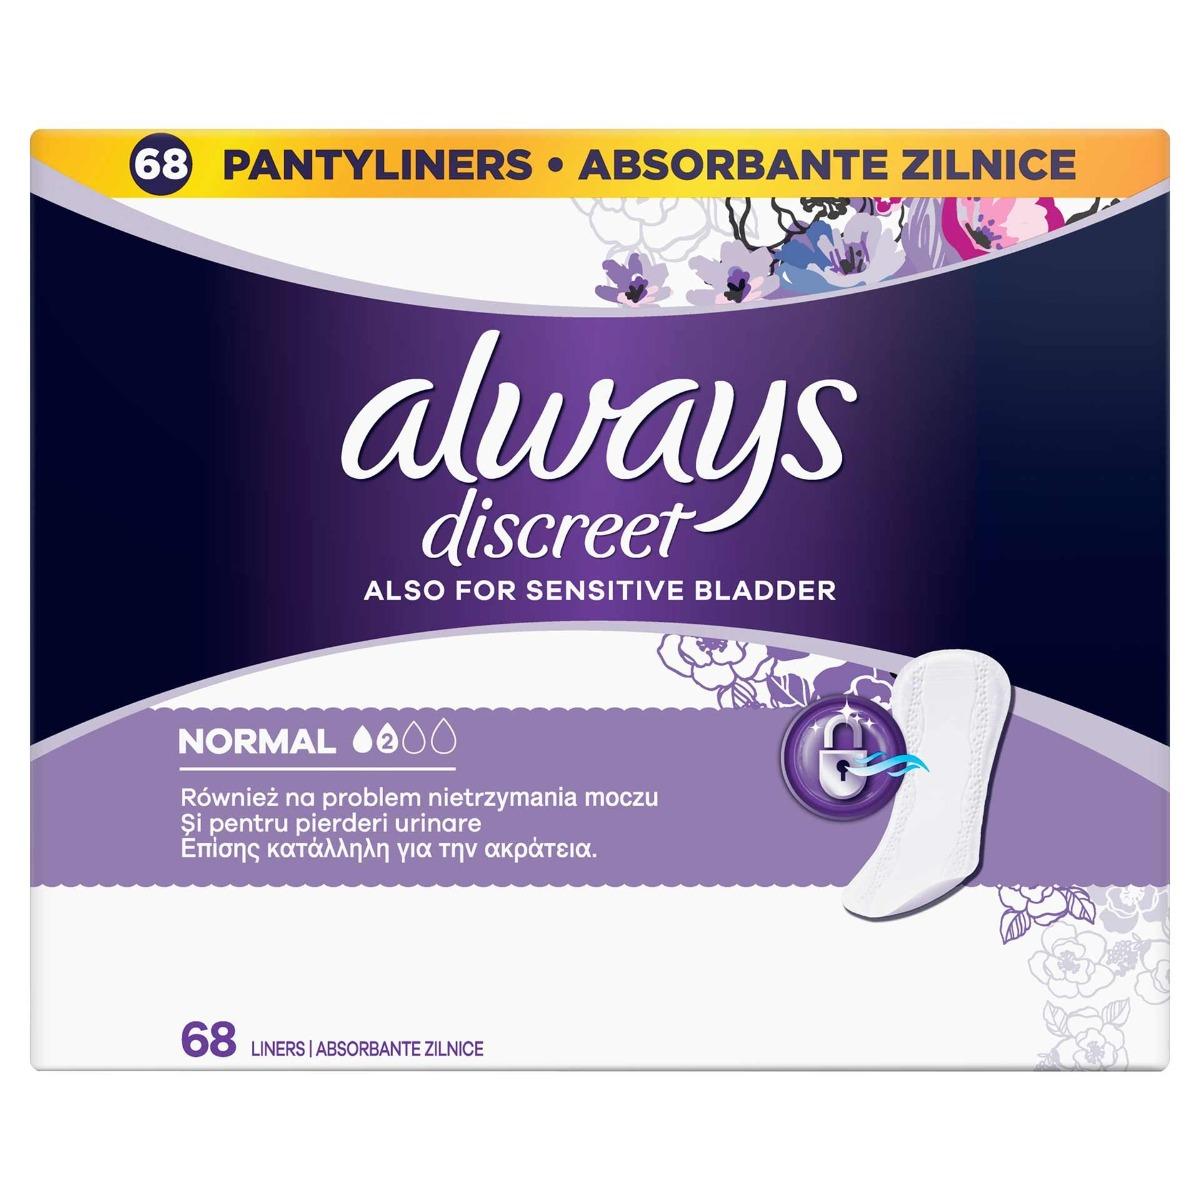 Absorbante zilnice pentru incontinenta urinara Discreet Liners Normal, 68 bucati, Always drmax.ro